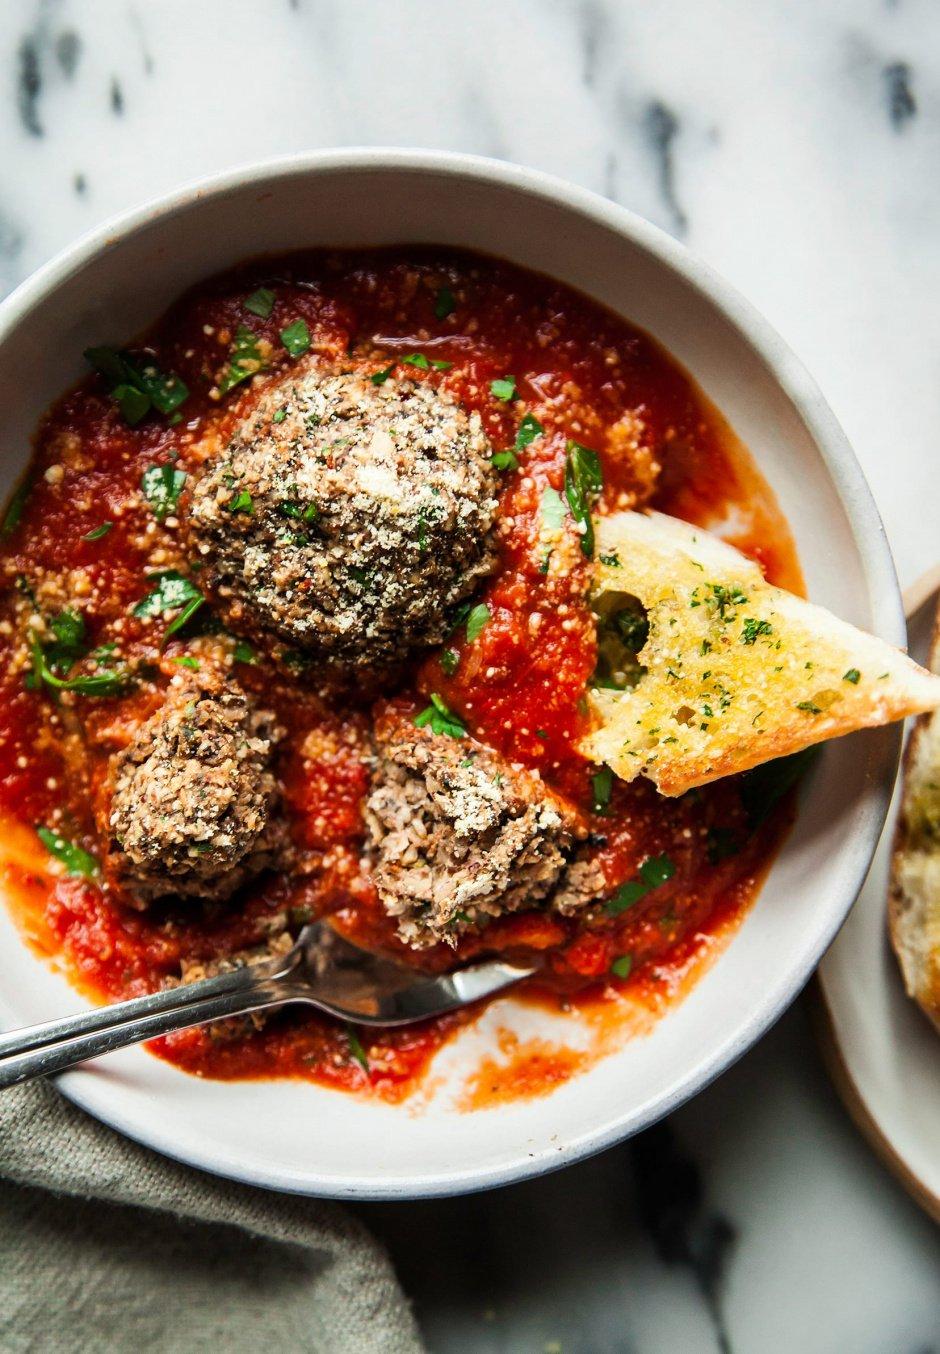 Giant Vegan Mushroom Meatballs Amp Garlic Bread 187 The First Mess Plant Based Recipes